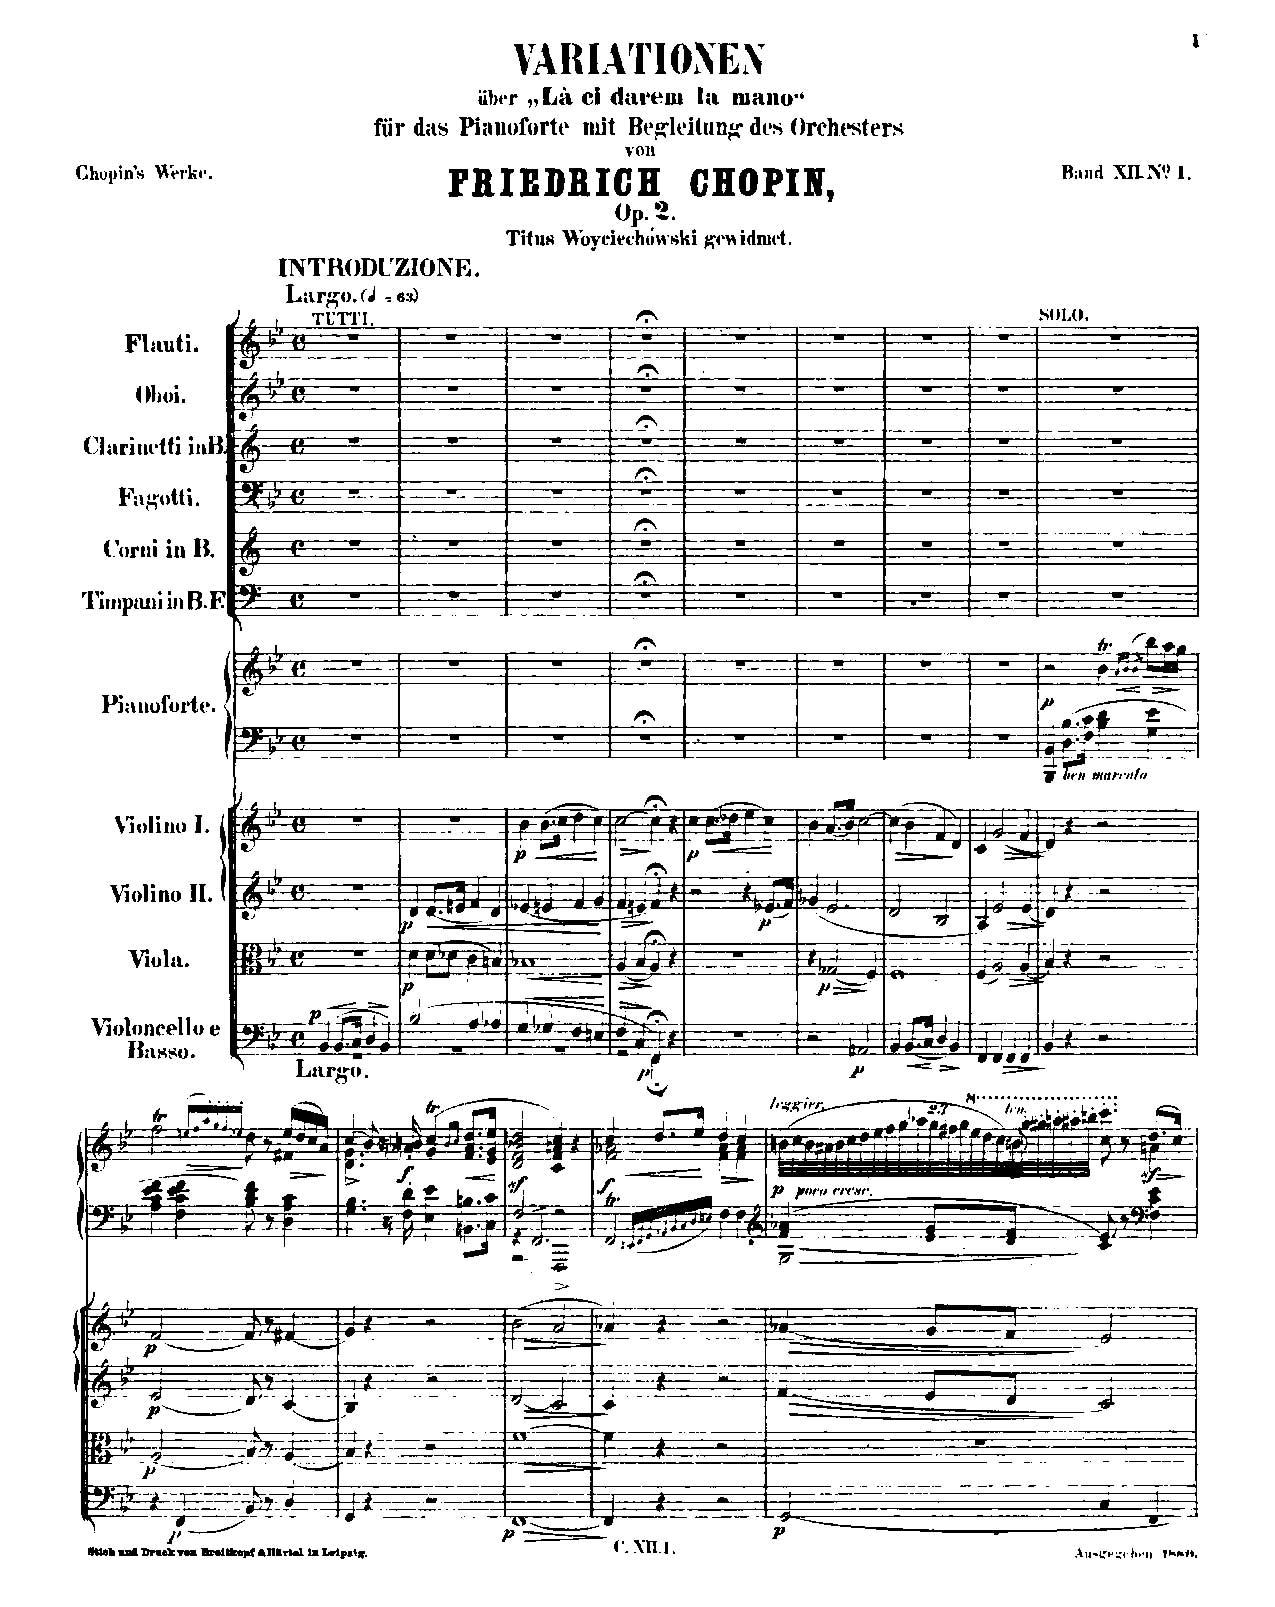 Chopin op. 2